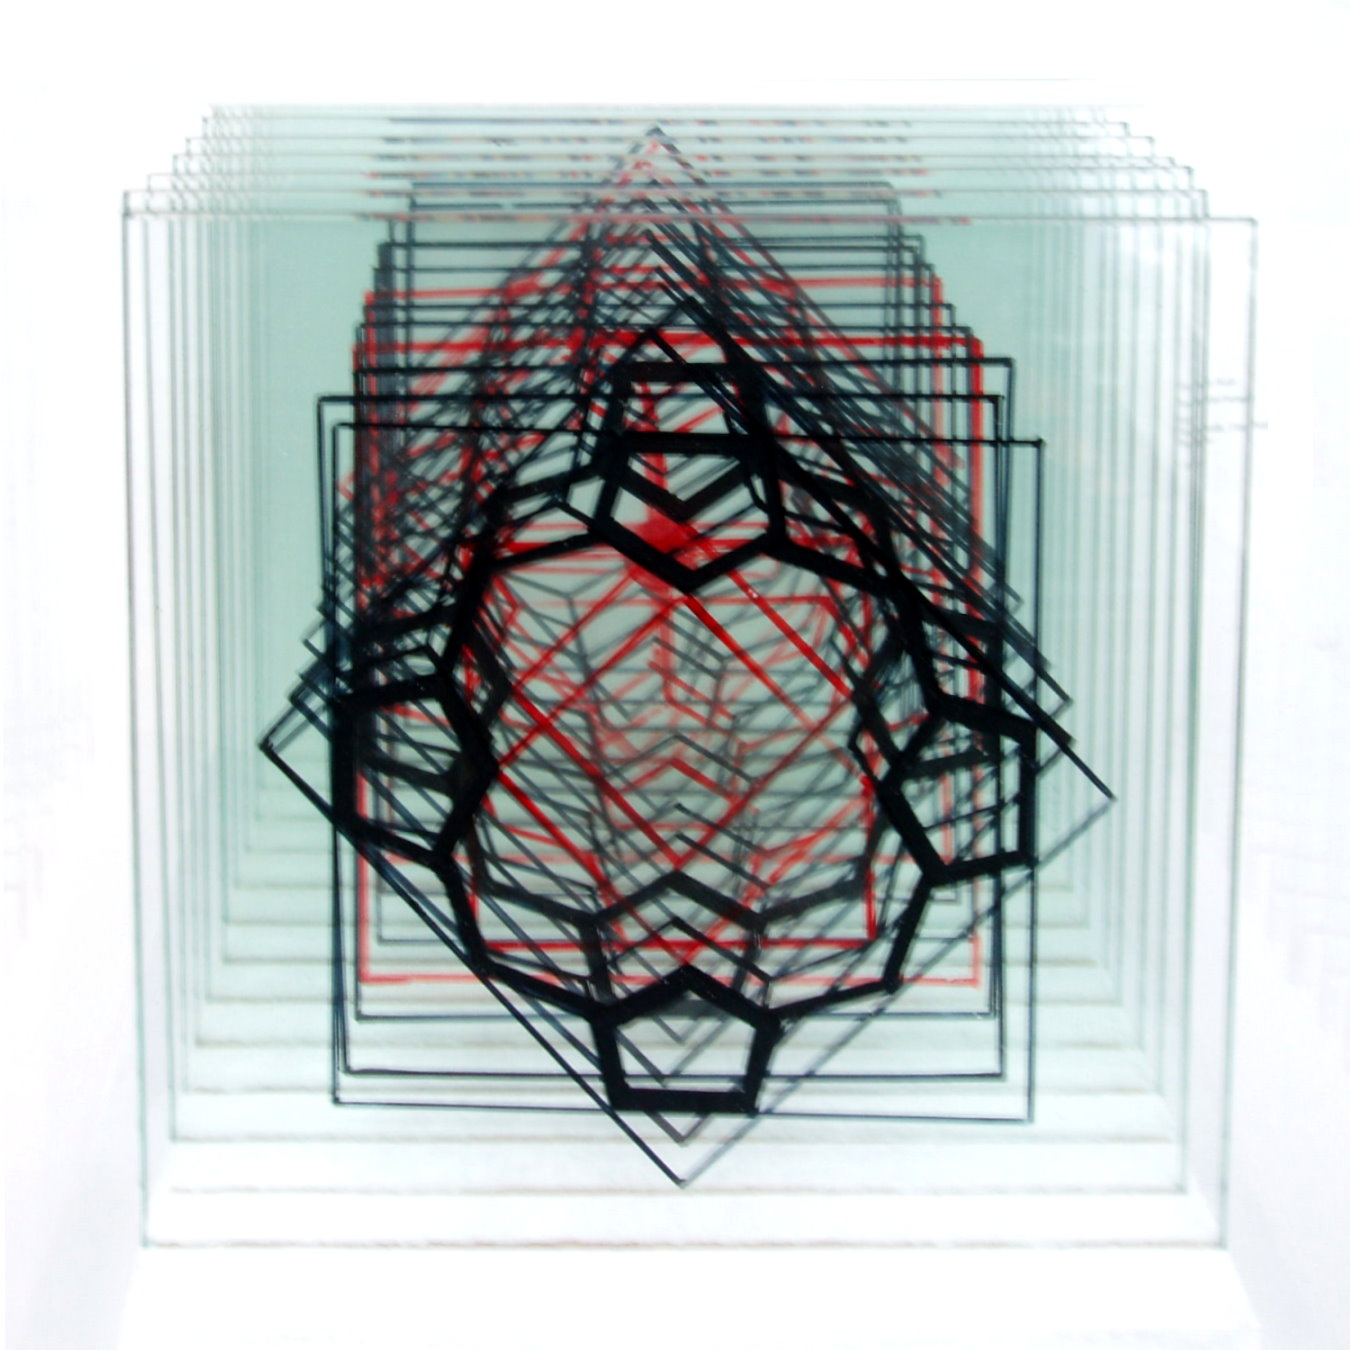 Tischobjekt - Porphyrin